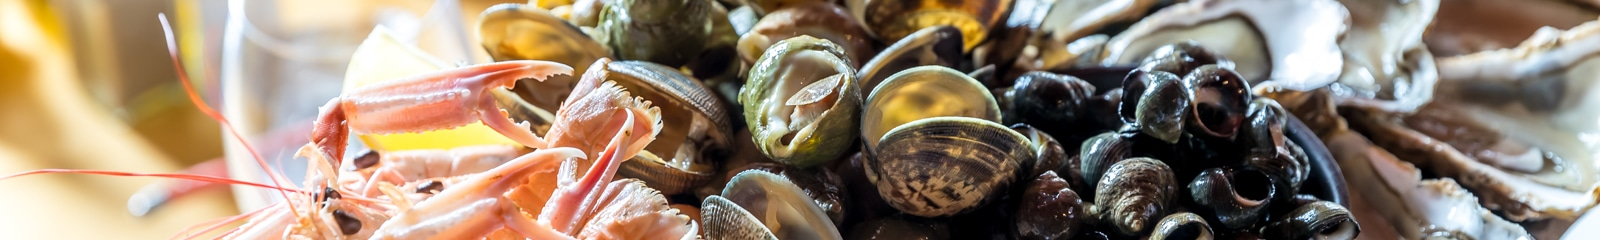 Plateau de fruits de mer dans un restaurants de fruits de mer à Carnac